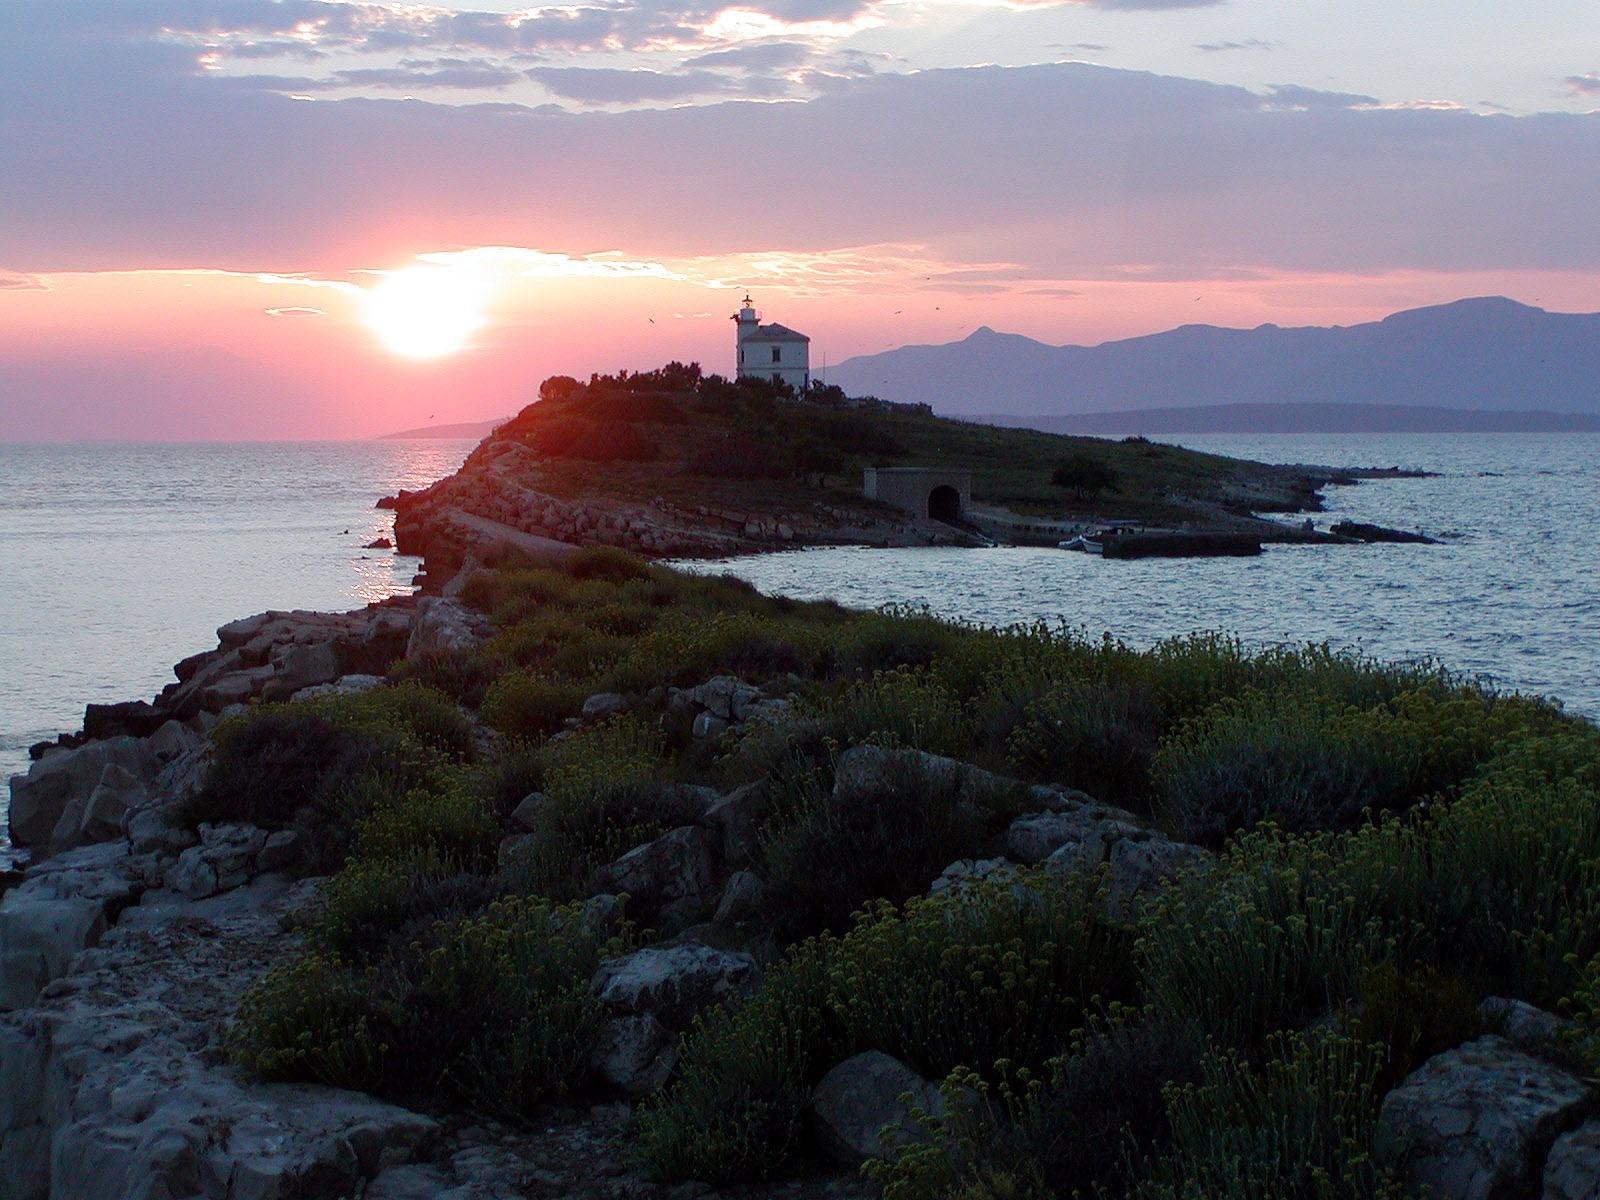 Lighthouse Plocica